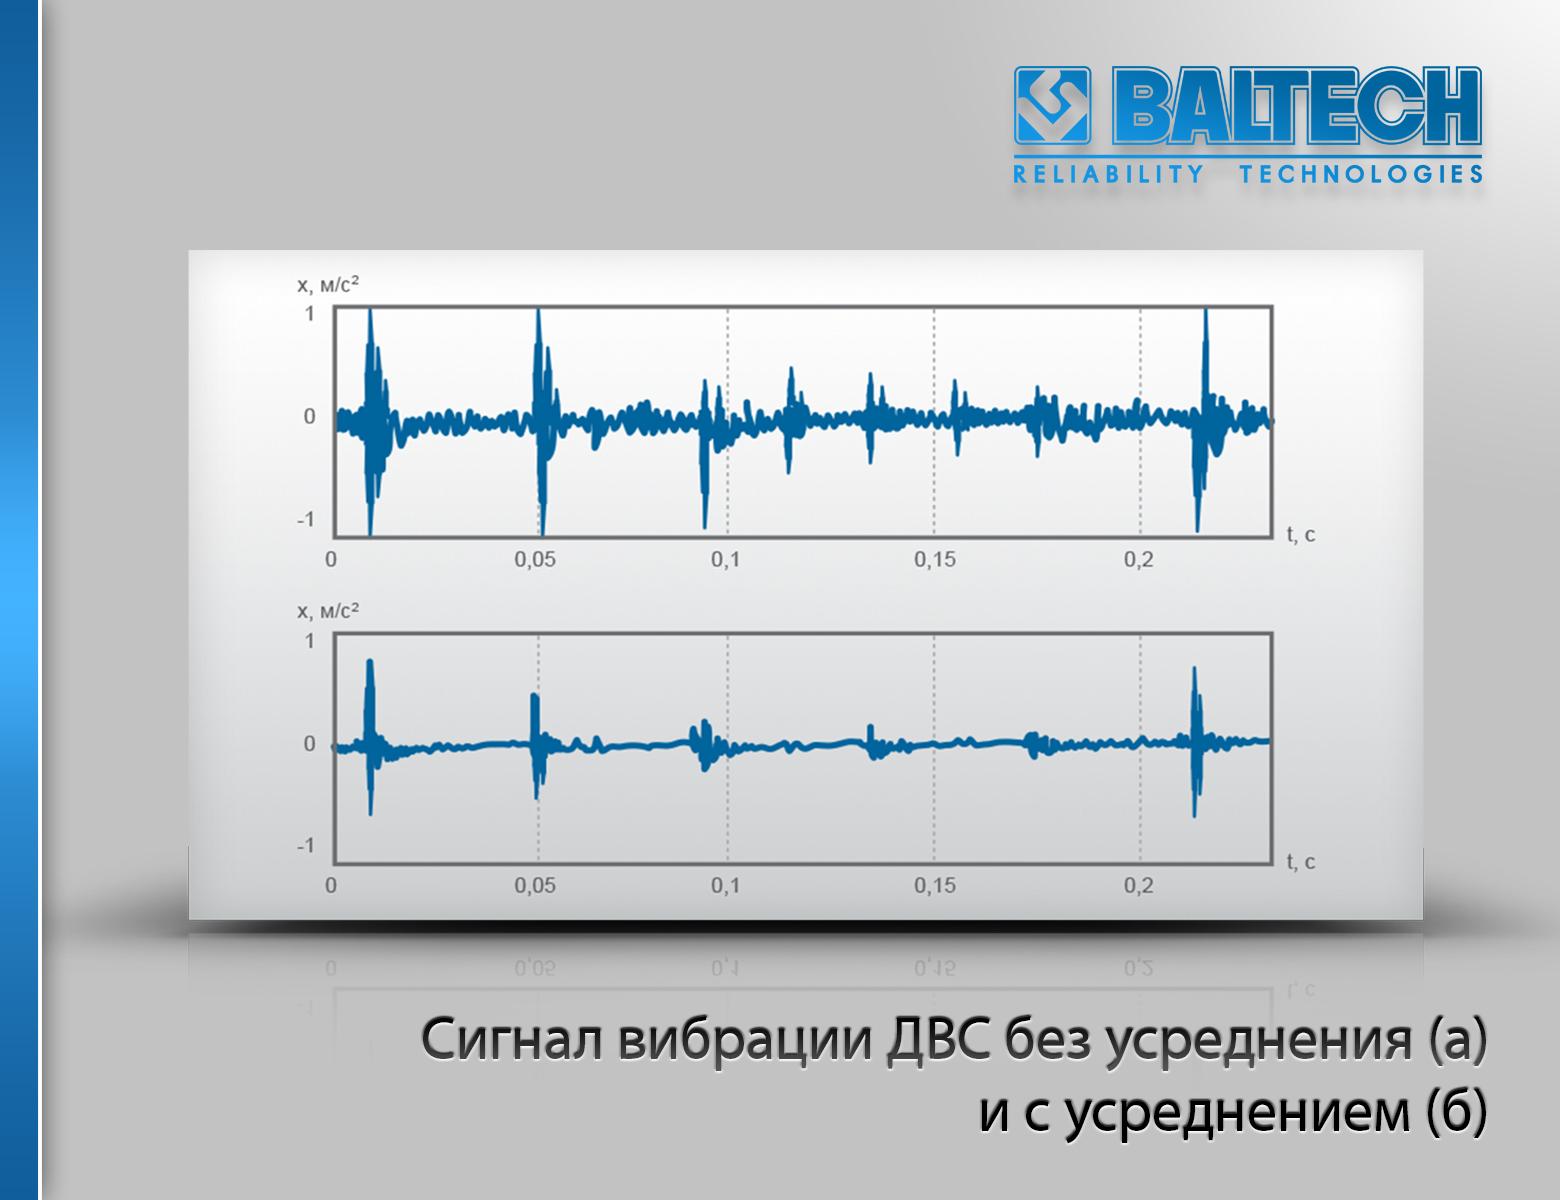 Сигнал вибрации ДВС, диагностика дизелей, анализ вибрации, вибродиагностика